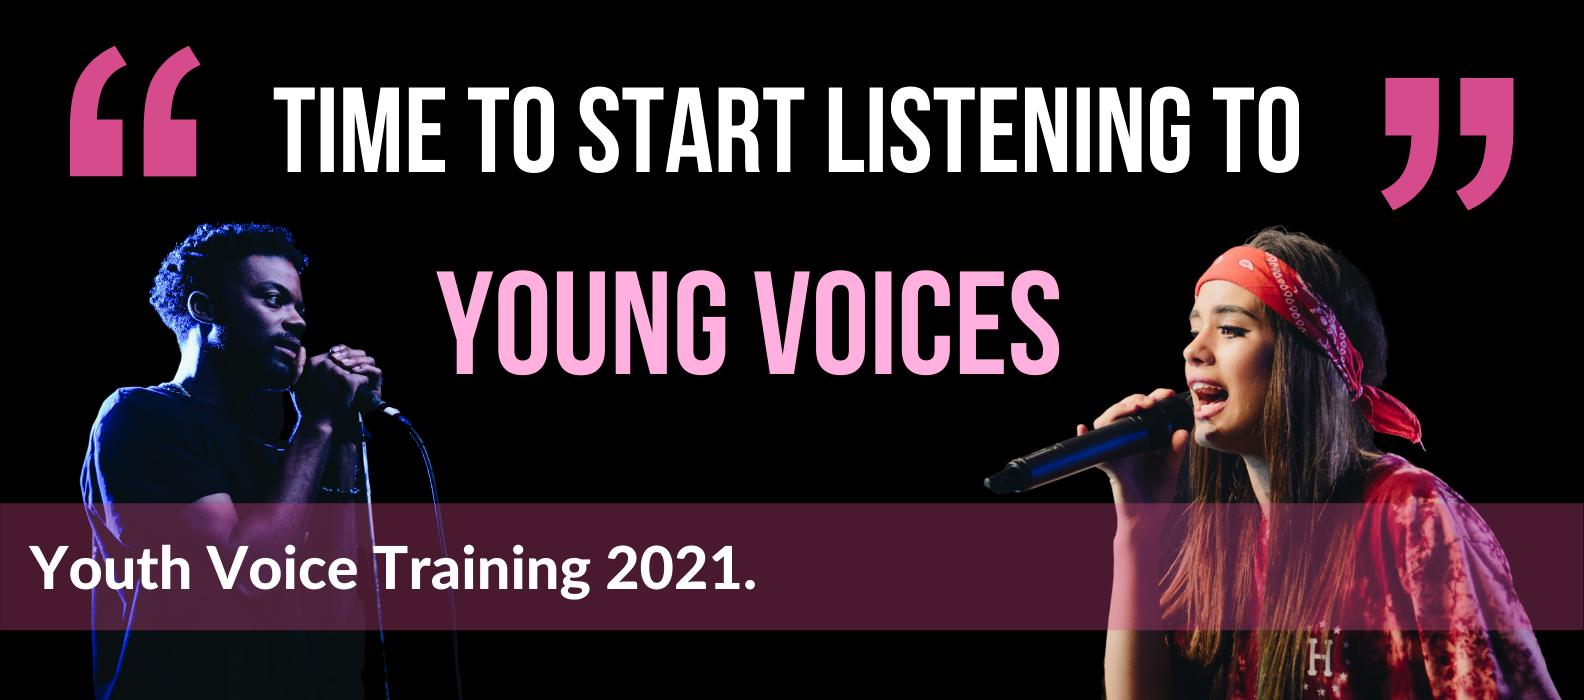 Youth Voice Training November 2021